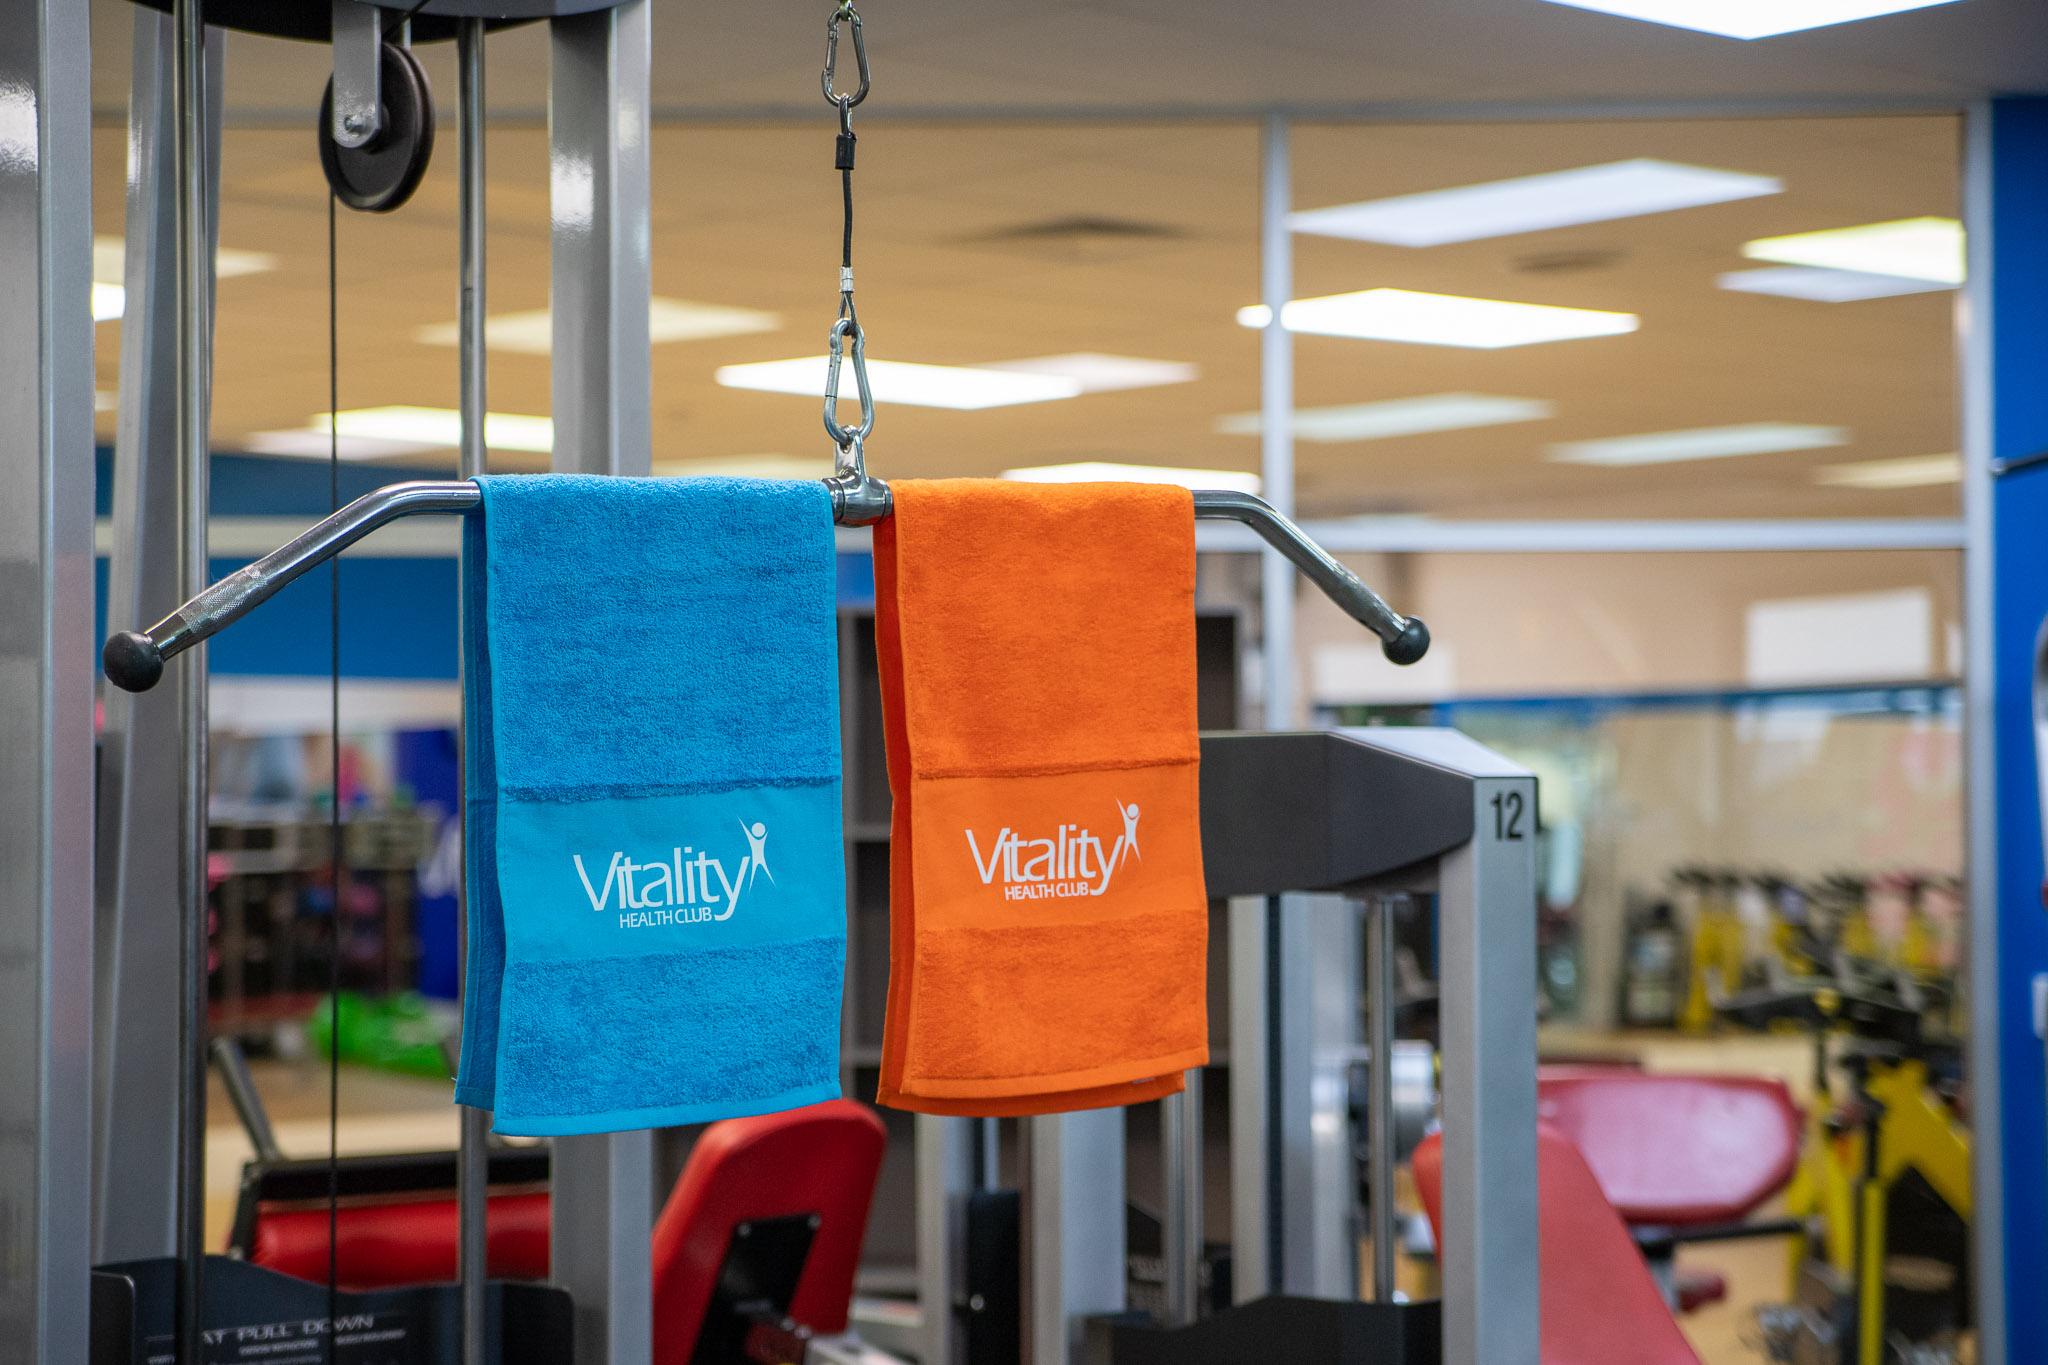 promotional, product, towel, berri